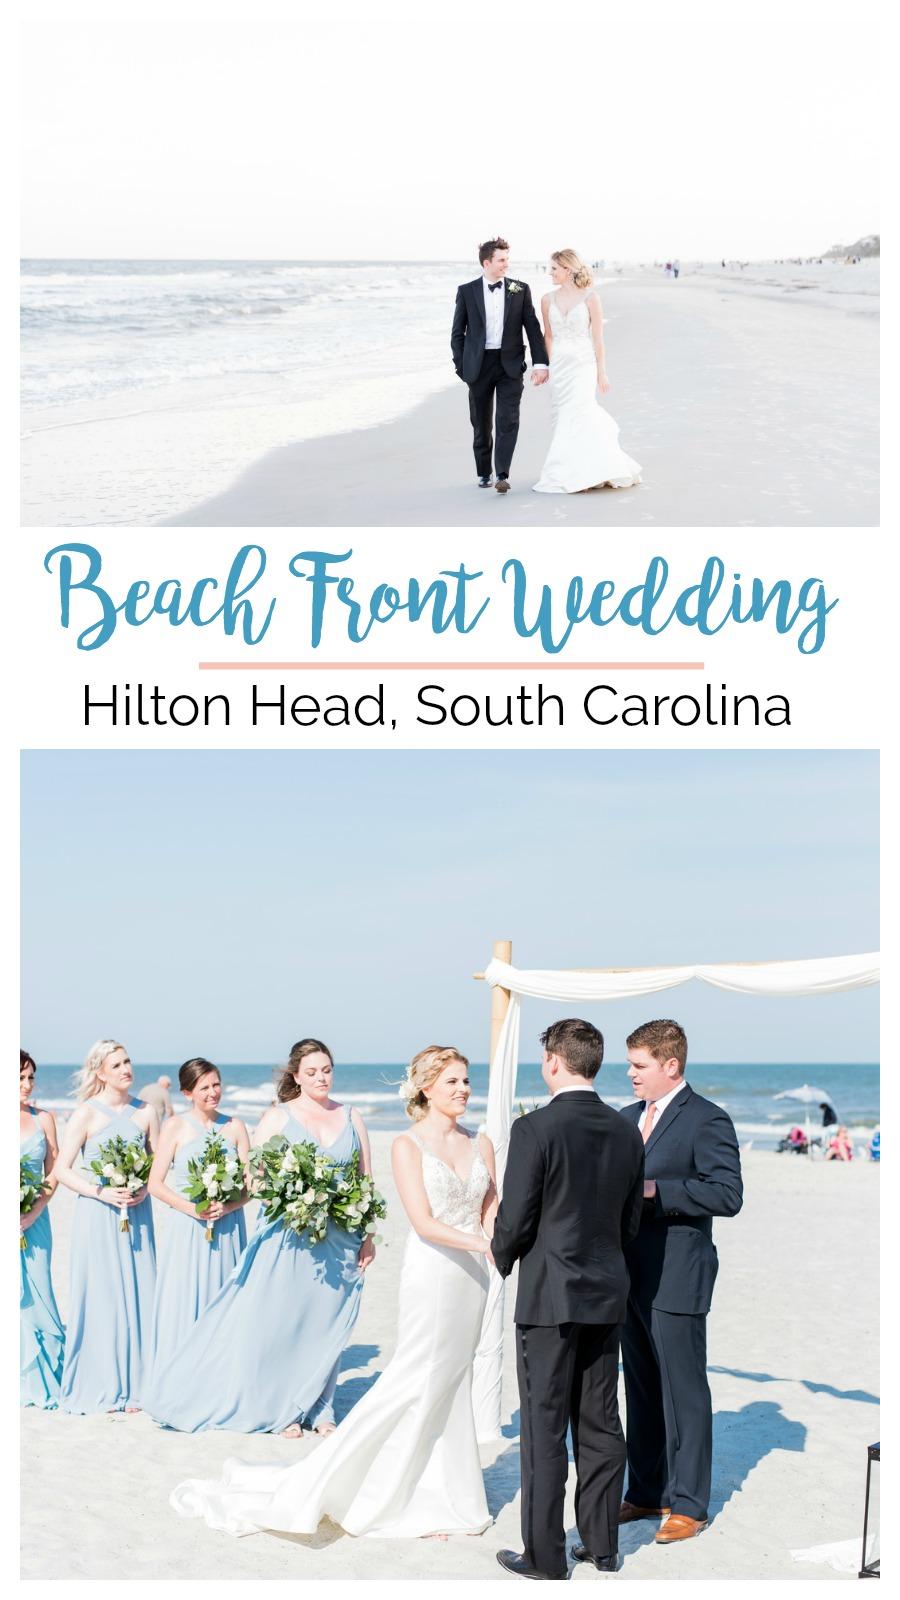 Jessica and Brian: Beach View Wedding at the Dunes House, Hilton Head Island, South Carolina   Palmetto State Weddings   beach front wedding   beach wedding inspiration